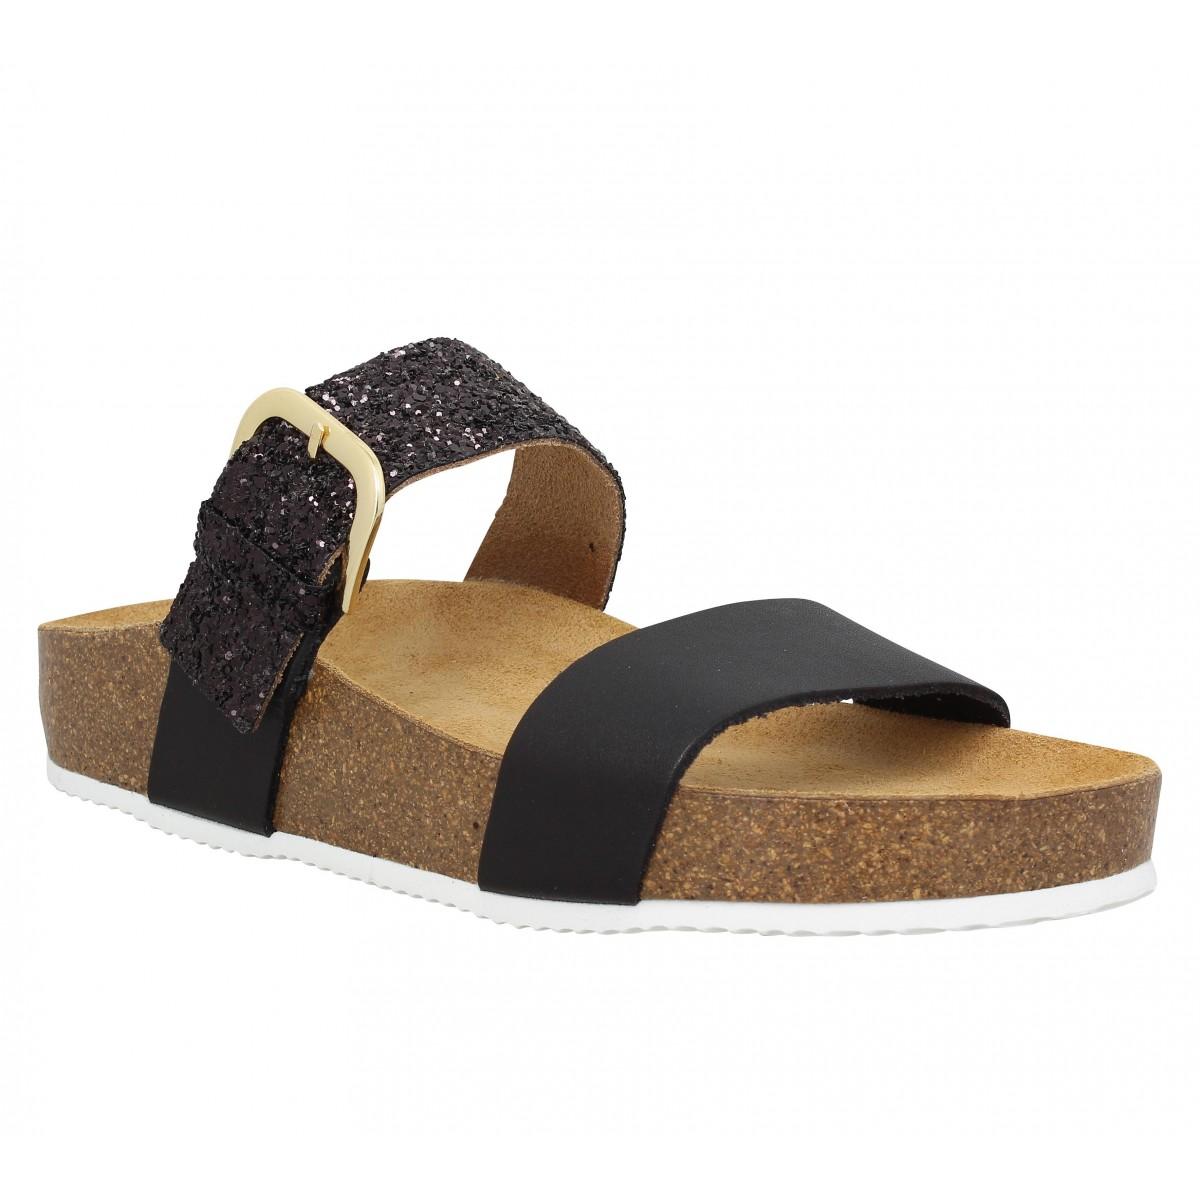 Nu-pieds TAKE ME 161 Glitter Femme Noir